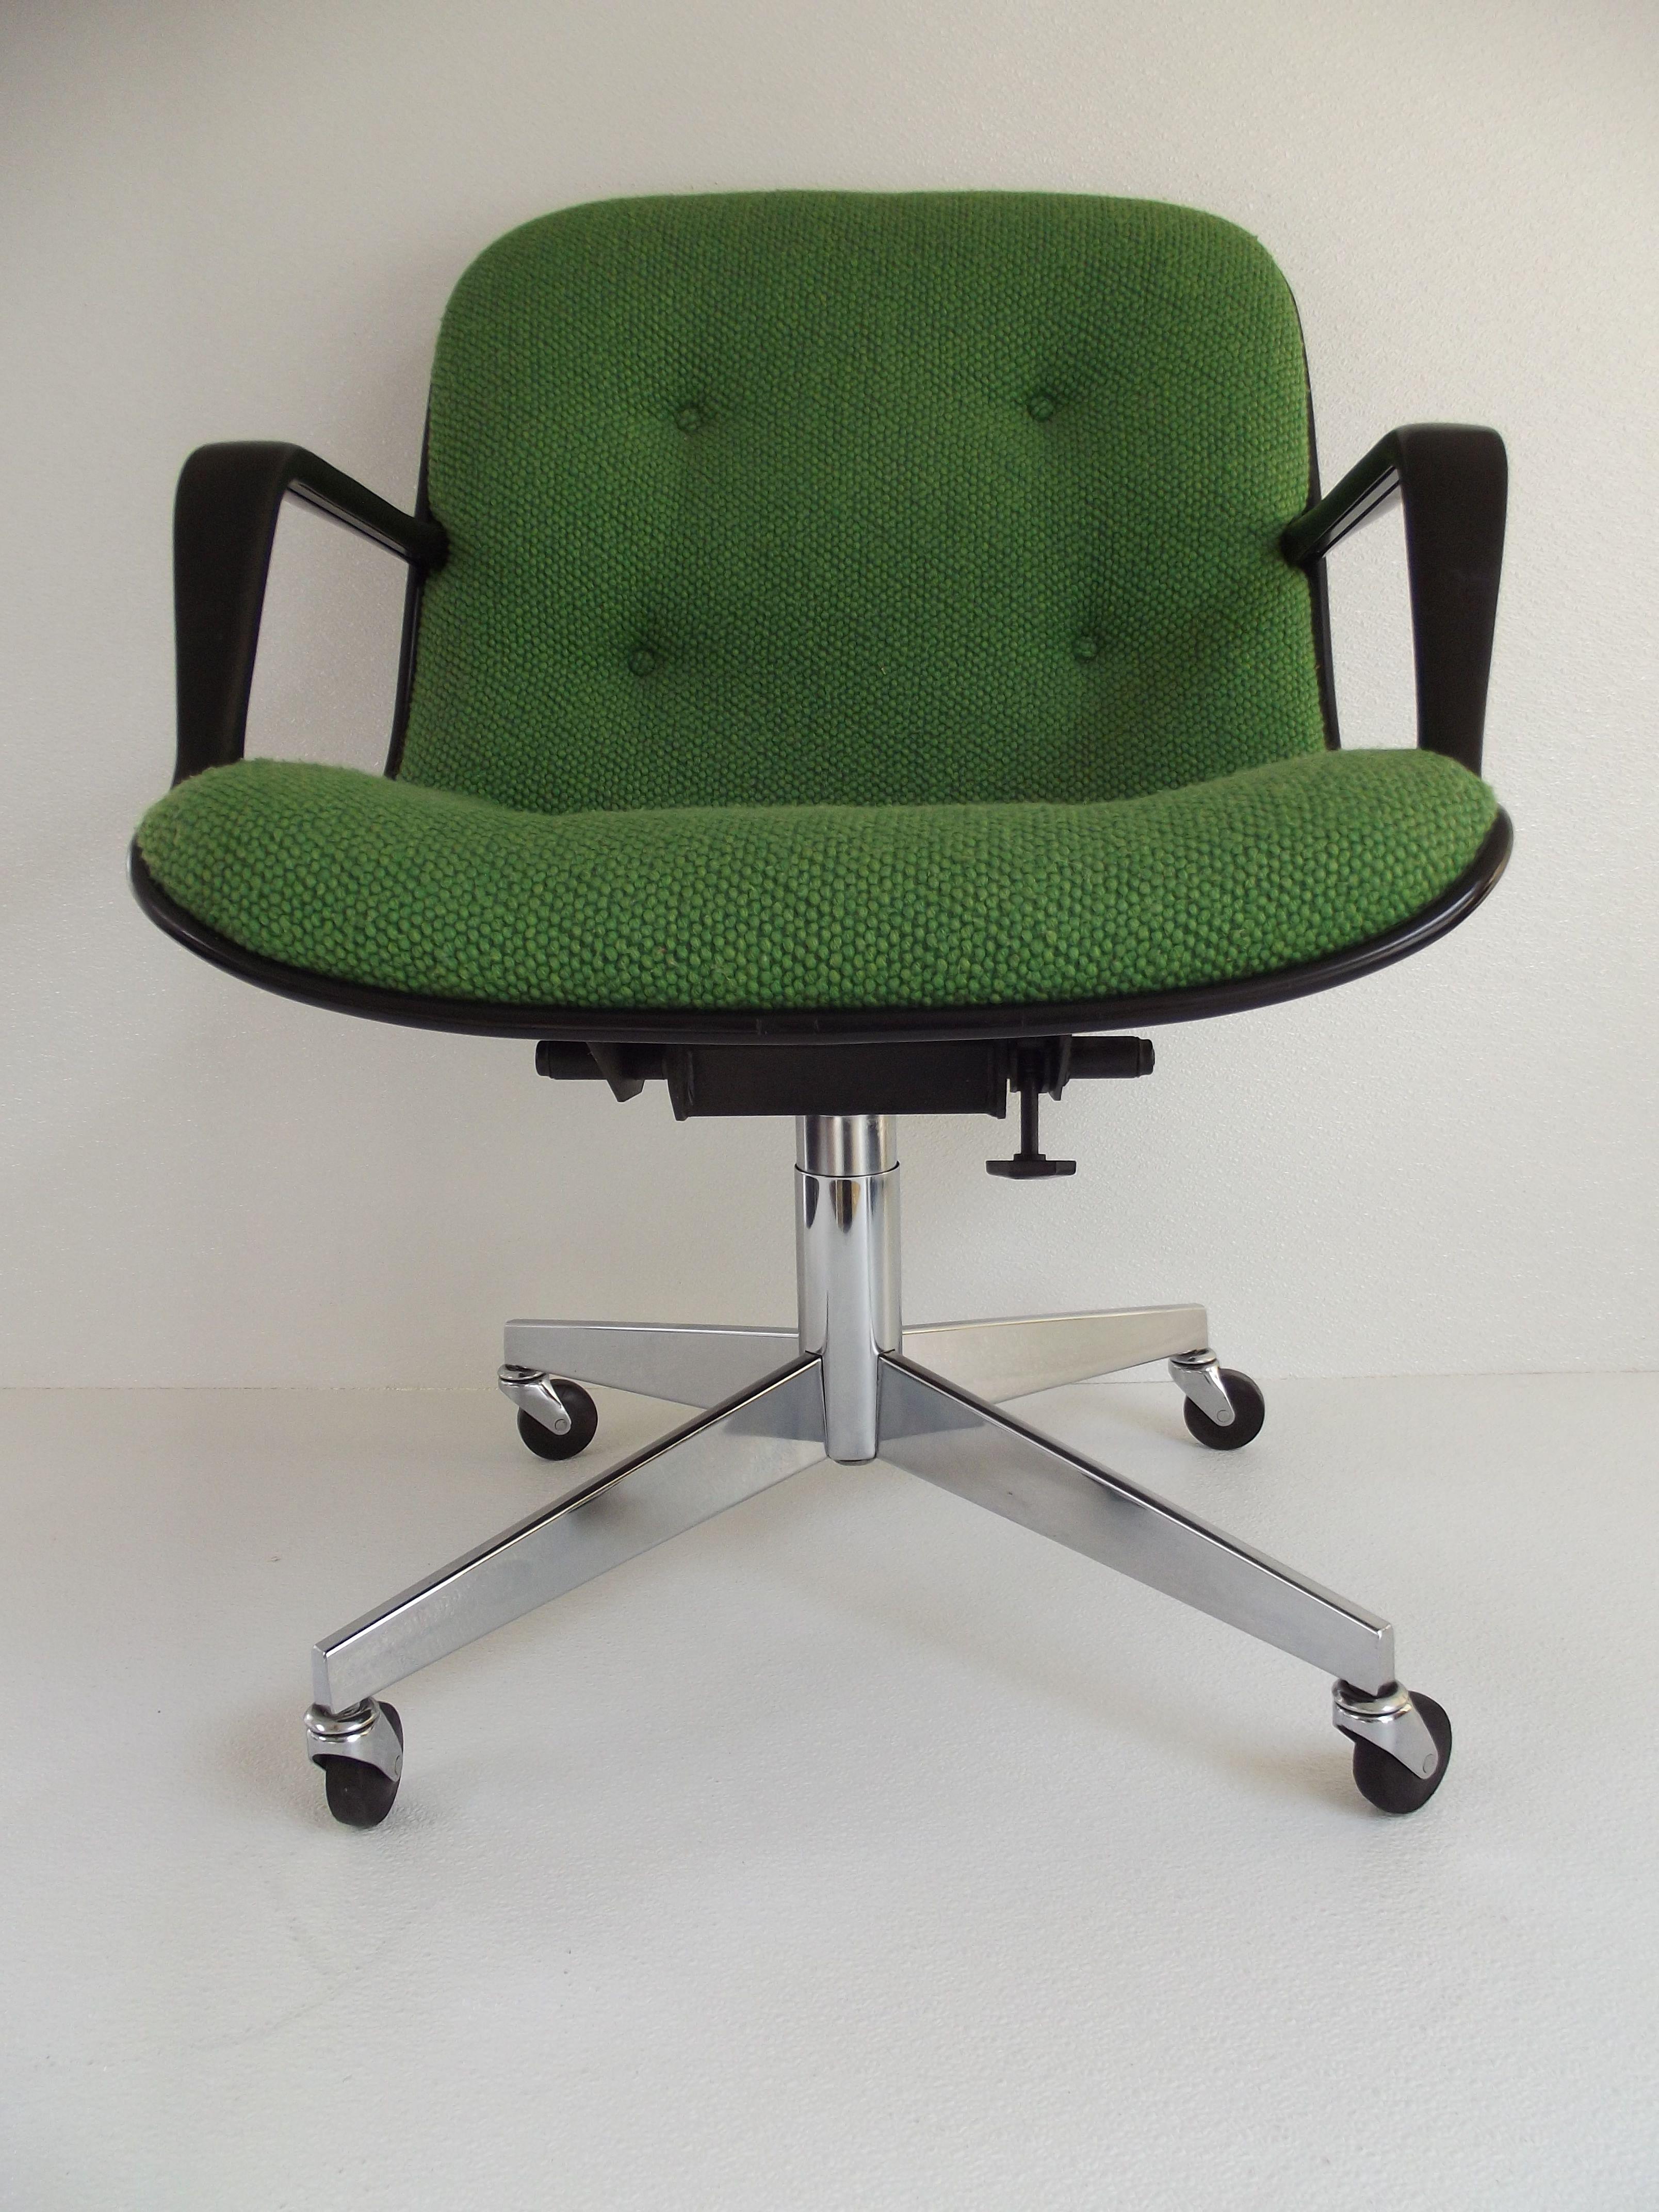 Gentil Vintage 1970u0027s Steelcase Swivel Tilt Office Chair Pollock Knoll Style